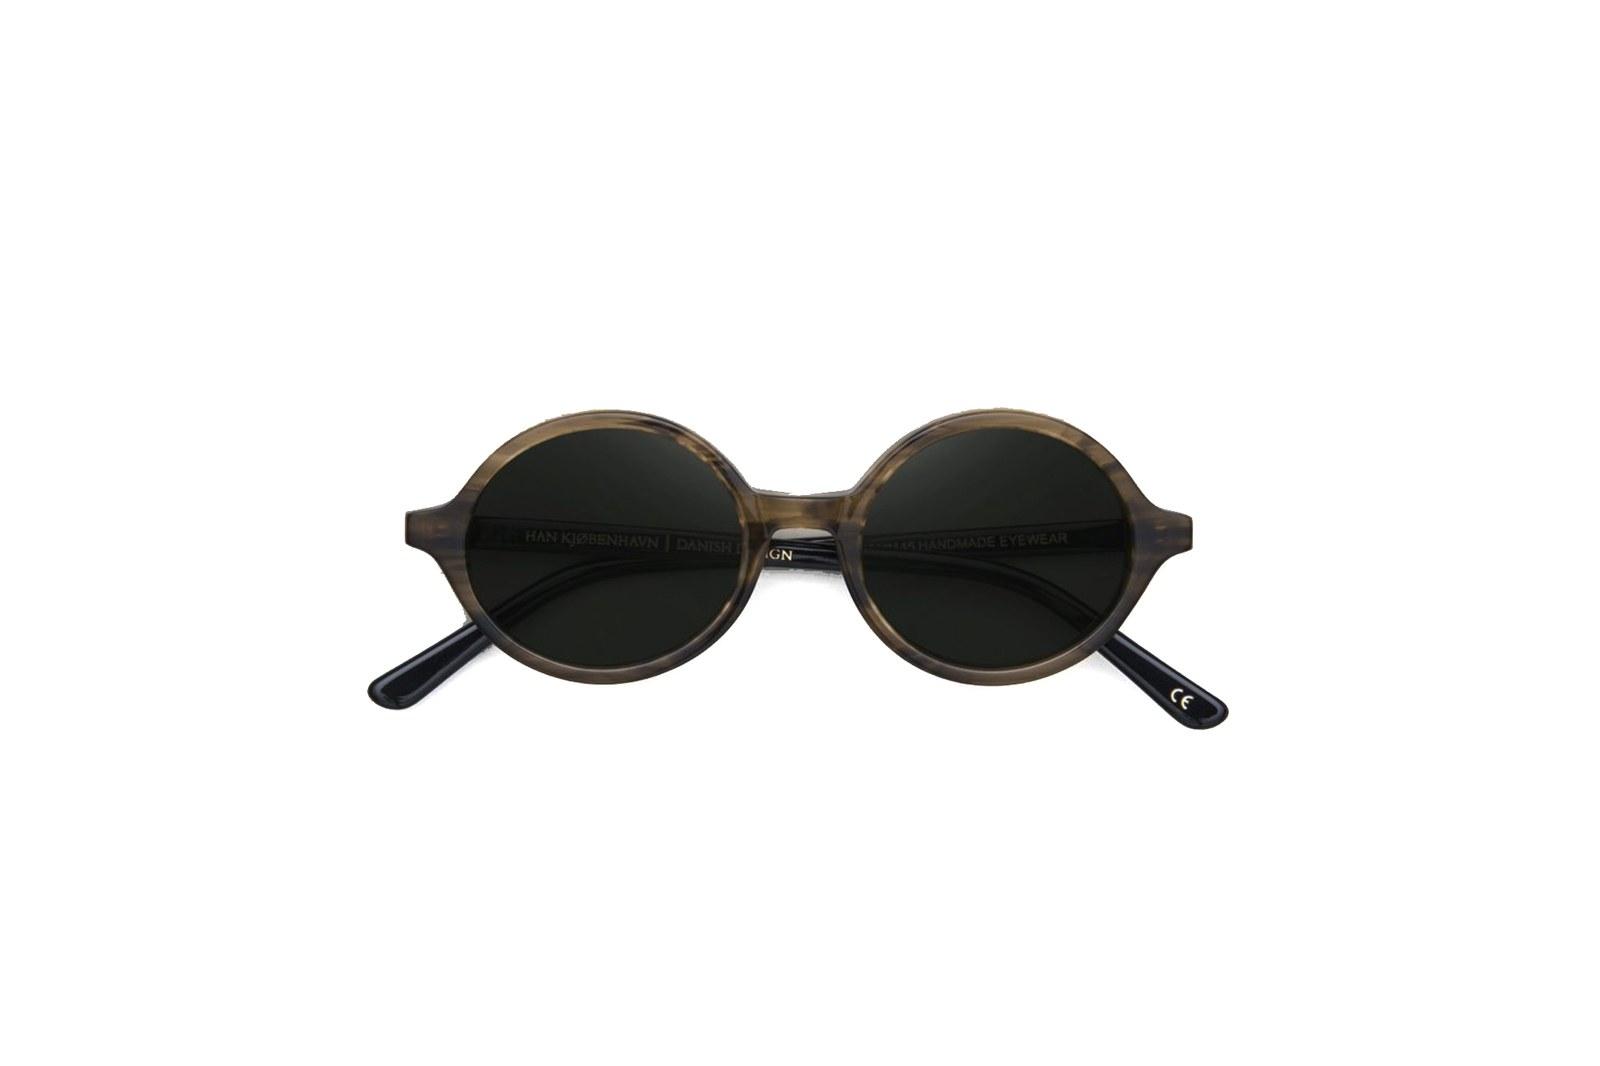 Kính Han Kjobenhavn Doc sunglasses